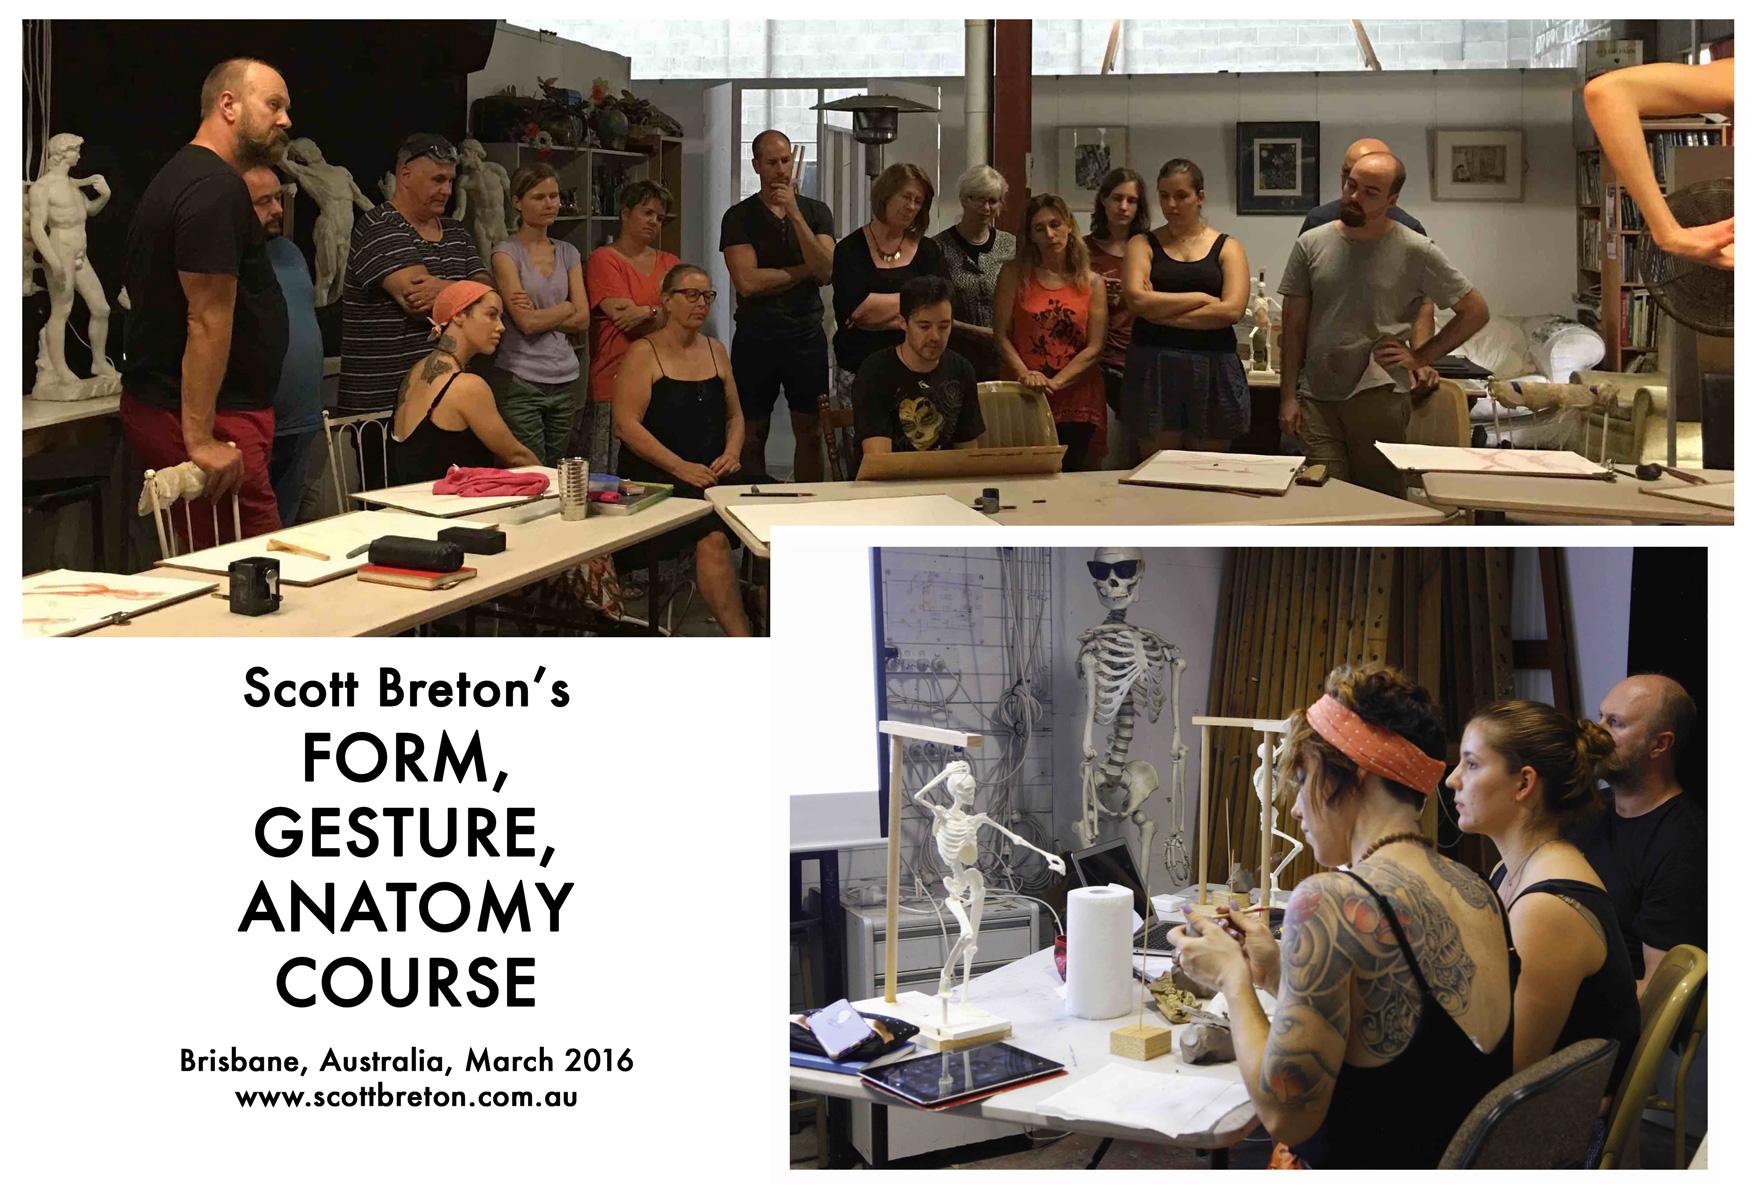 Scott-Breton-Form-Gesture-Anatomy-Drawing-course-2016-0001title.JPG